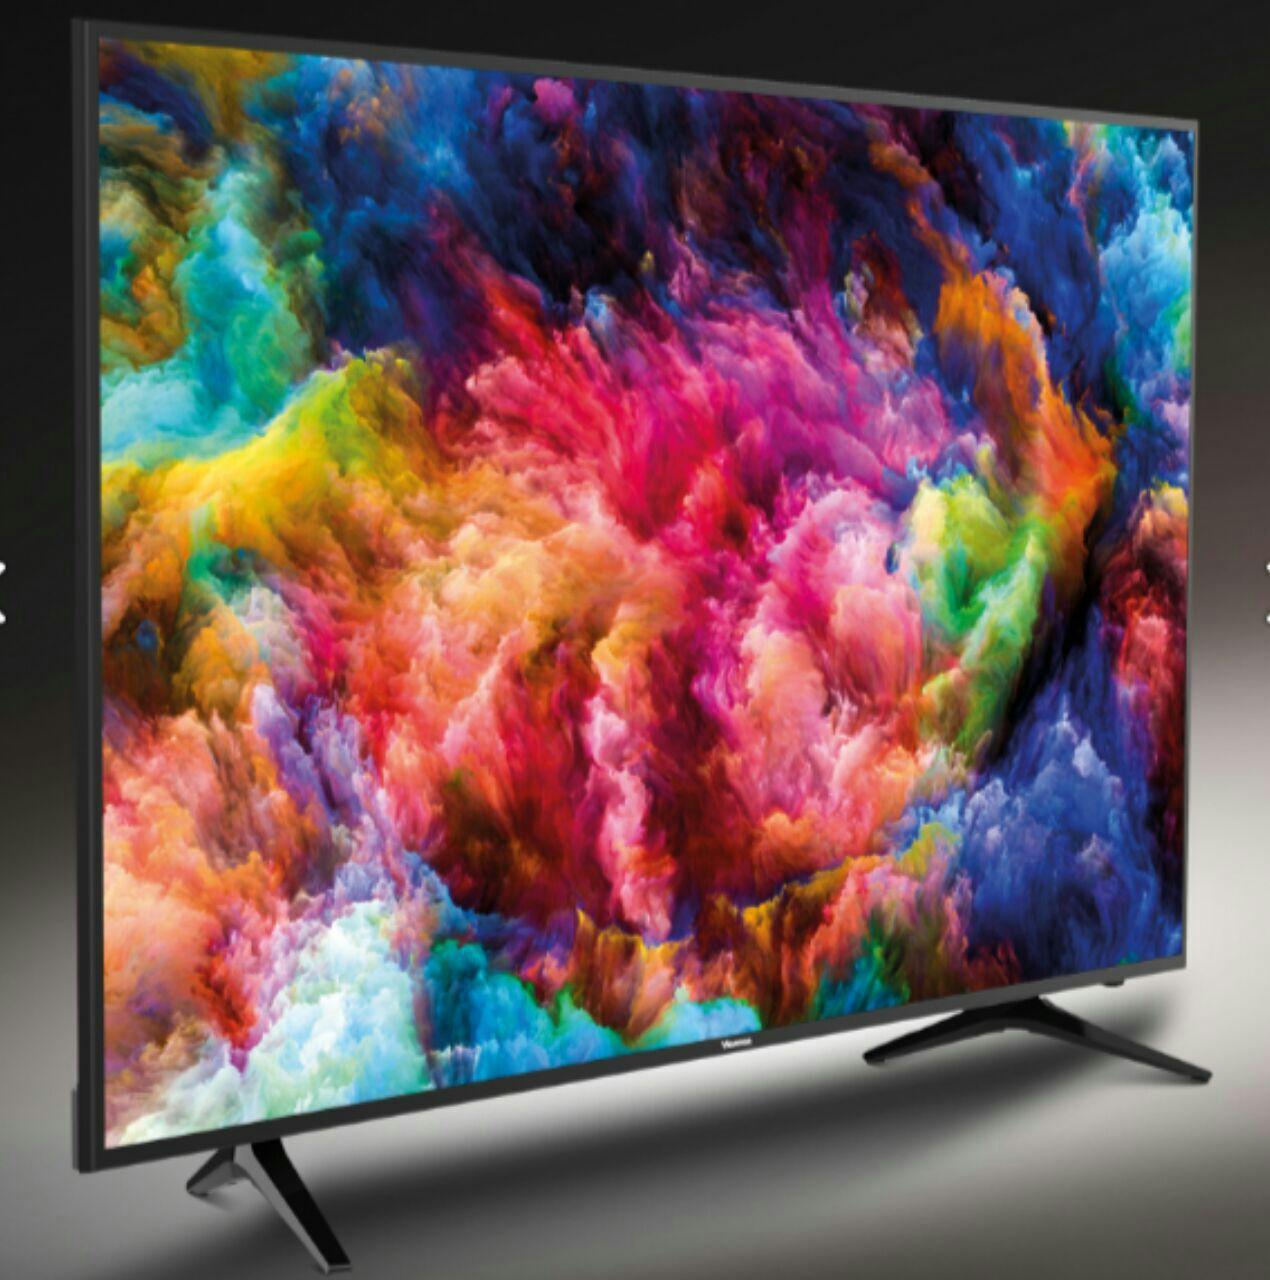 تلویزیون ال ای دی 55 اینچ فورکی اسمارت هایسنس hisense مدل 6100 فول آپشن